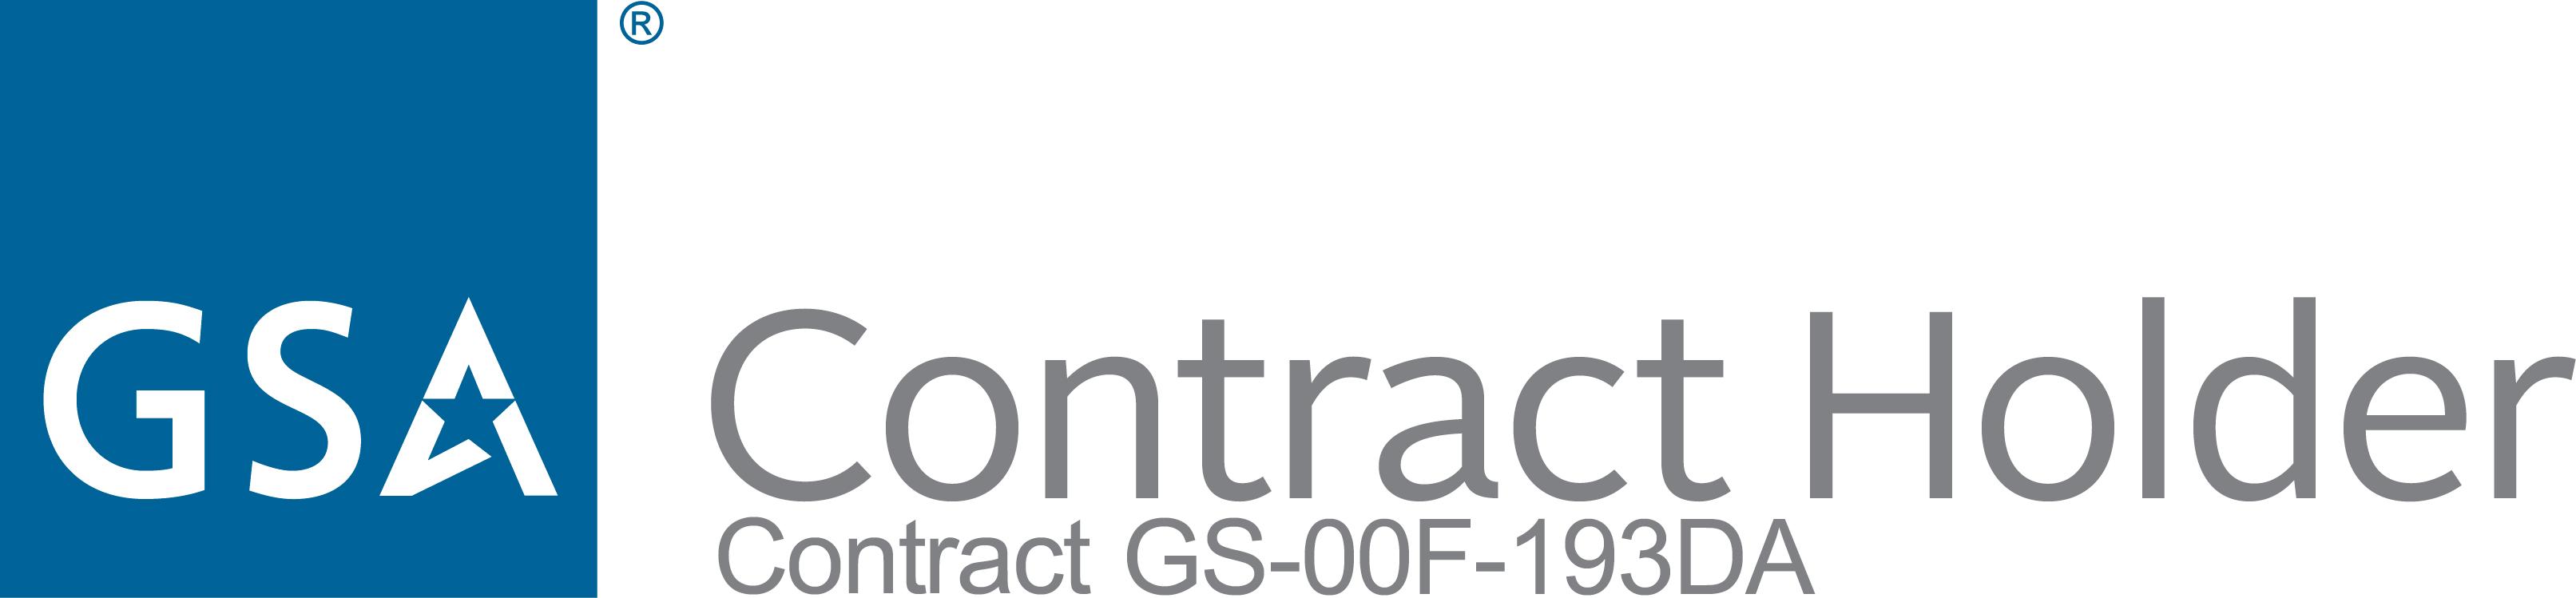 GSA-contract-holder